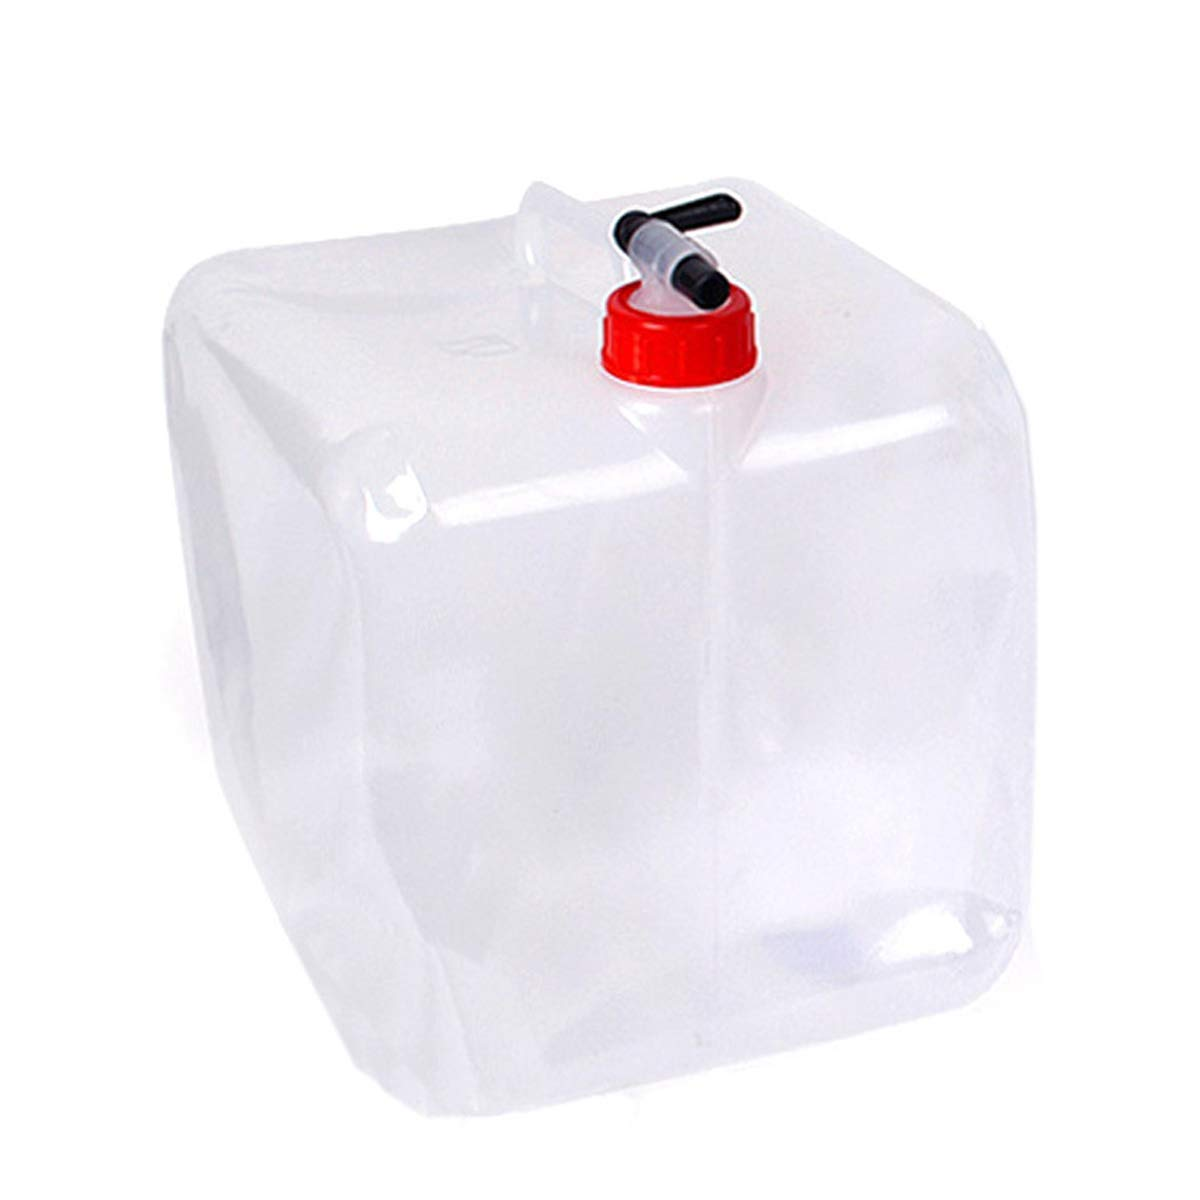 cjixnji Cubo de Agua Plegable Emergencia de Supervivencia Adecuado para Acampar Deportivo Senderismo Coche 20L de Agua Plegable al Aire Libre del Cubo Barbacoa Picnic